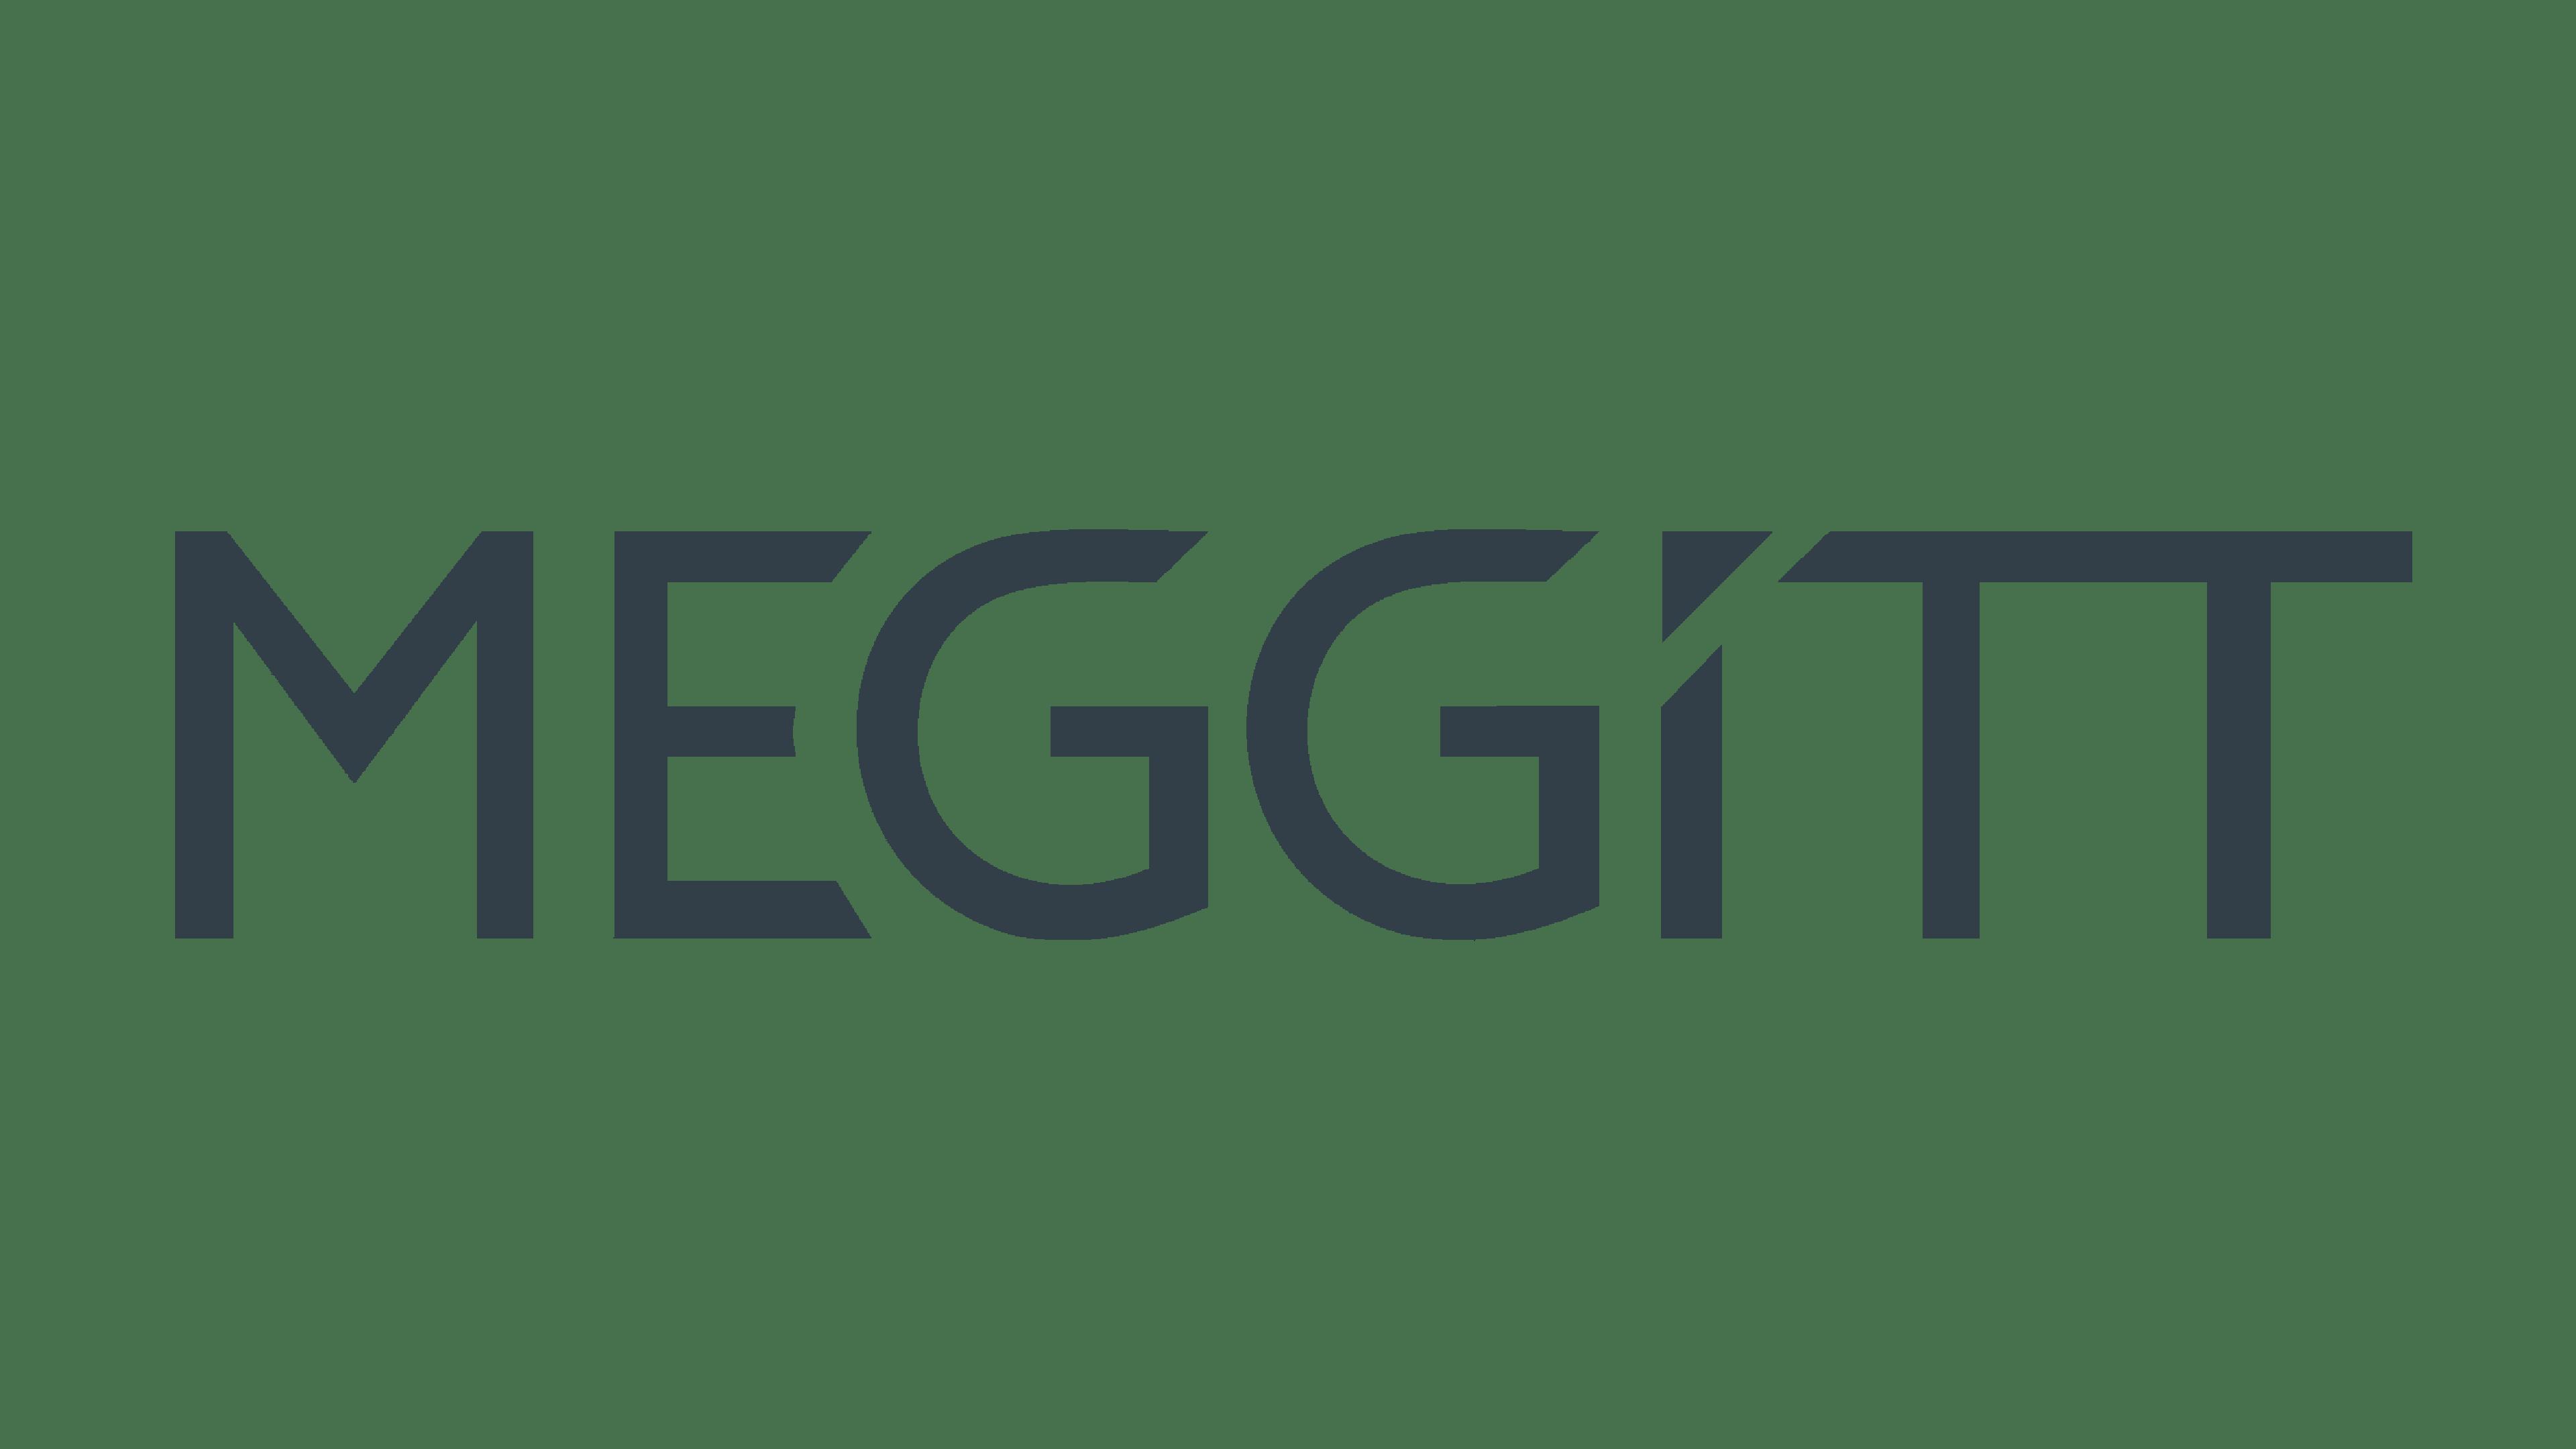 Meggitt Logo Logo